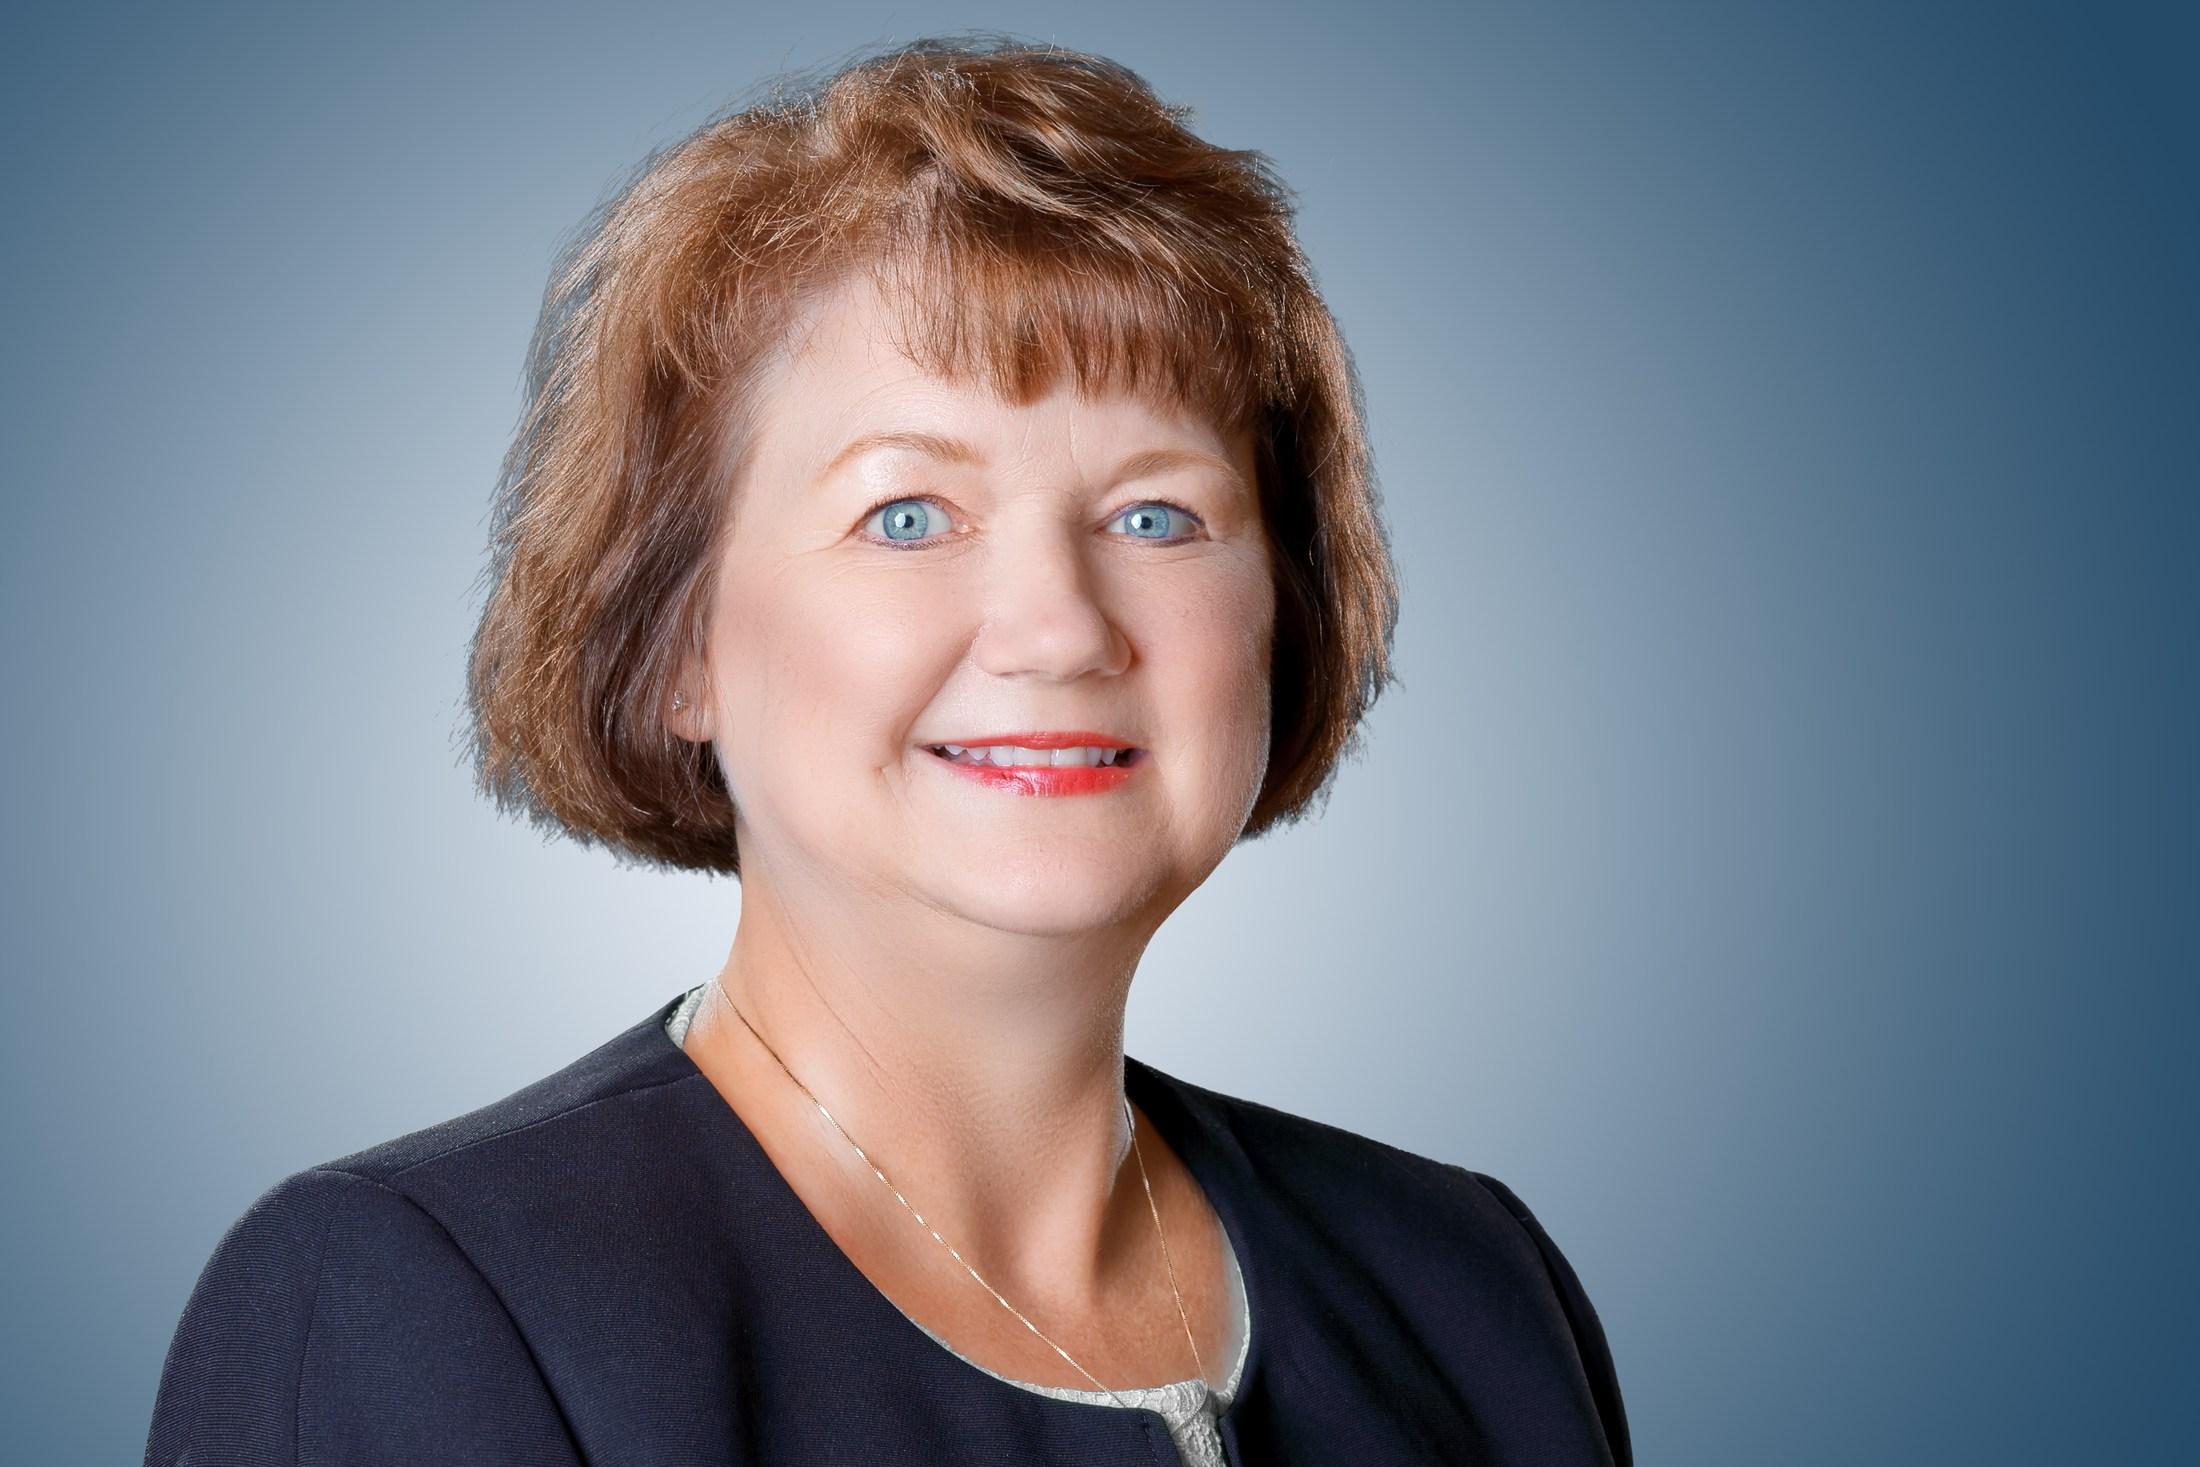 Superintendent/CEO Angela McDonald